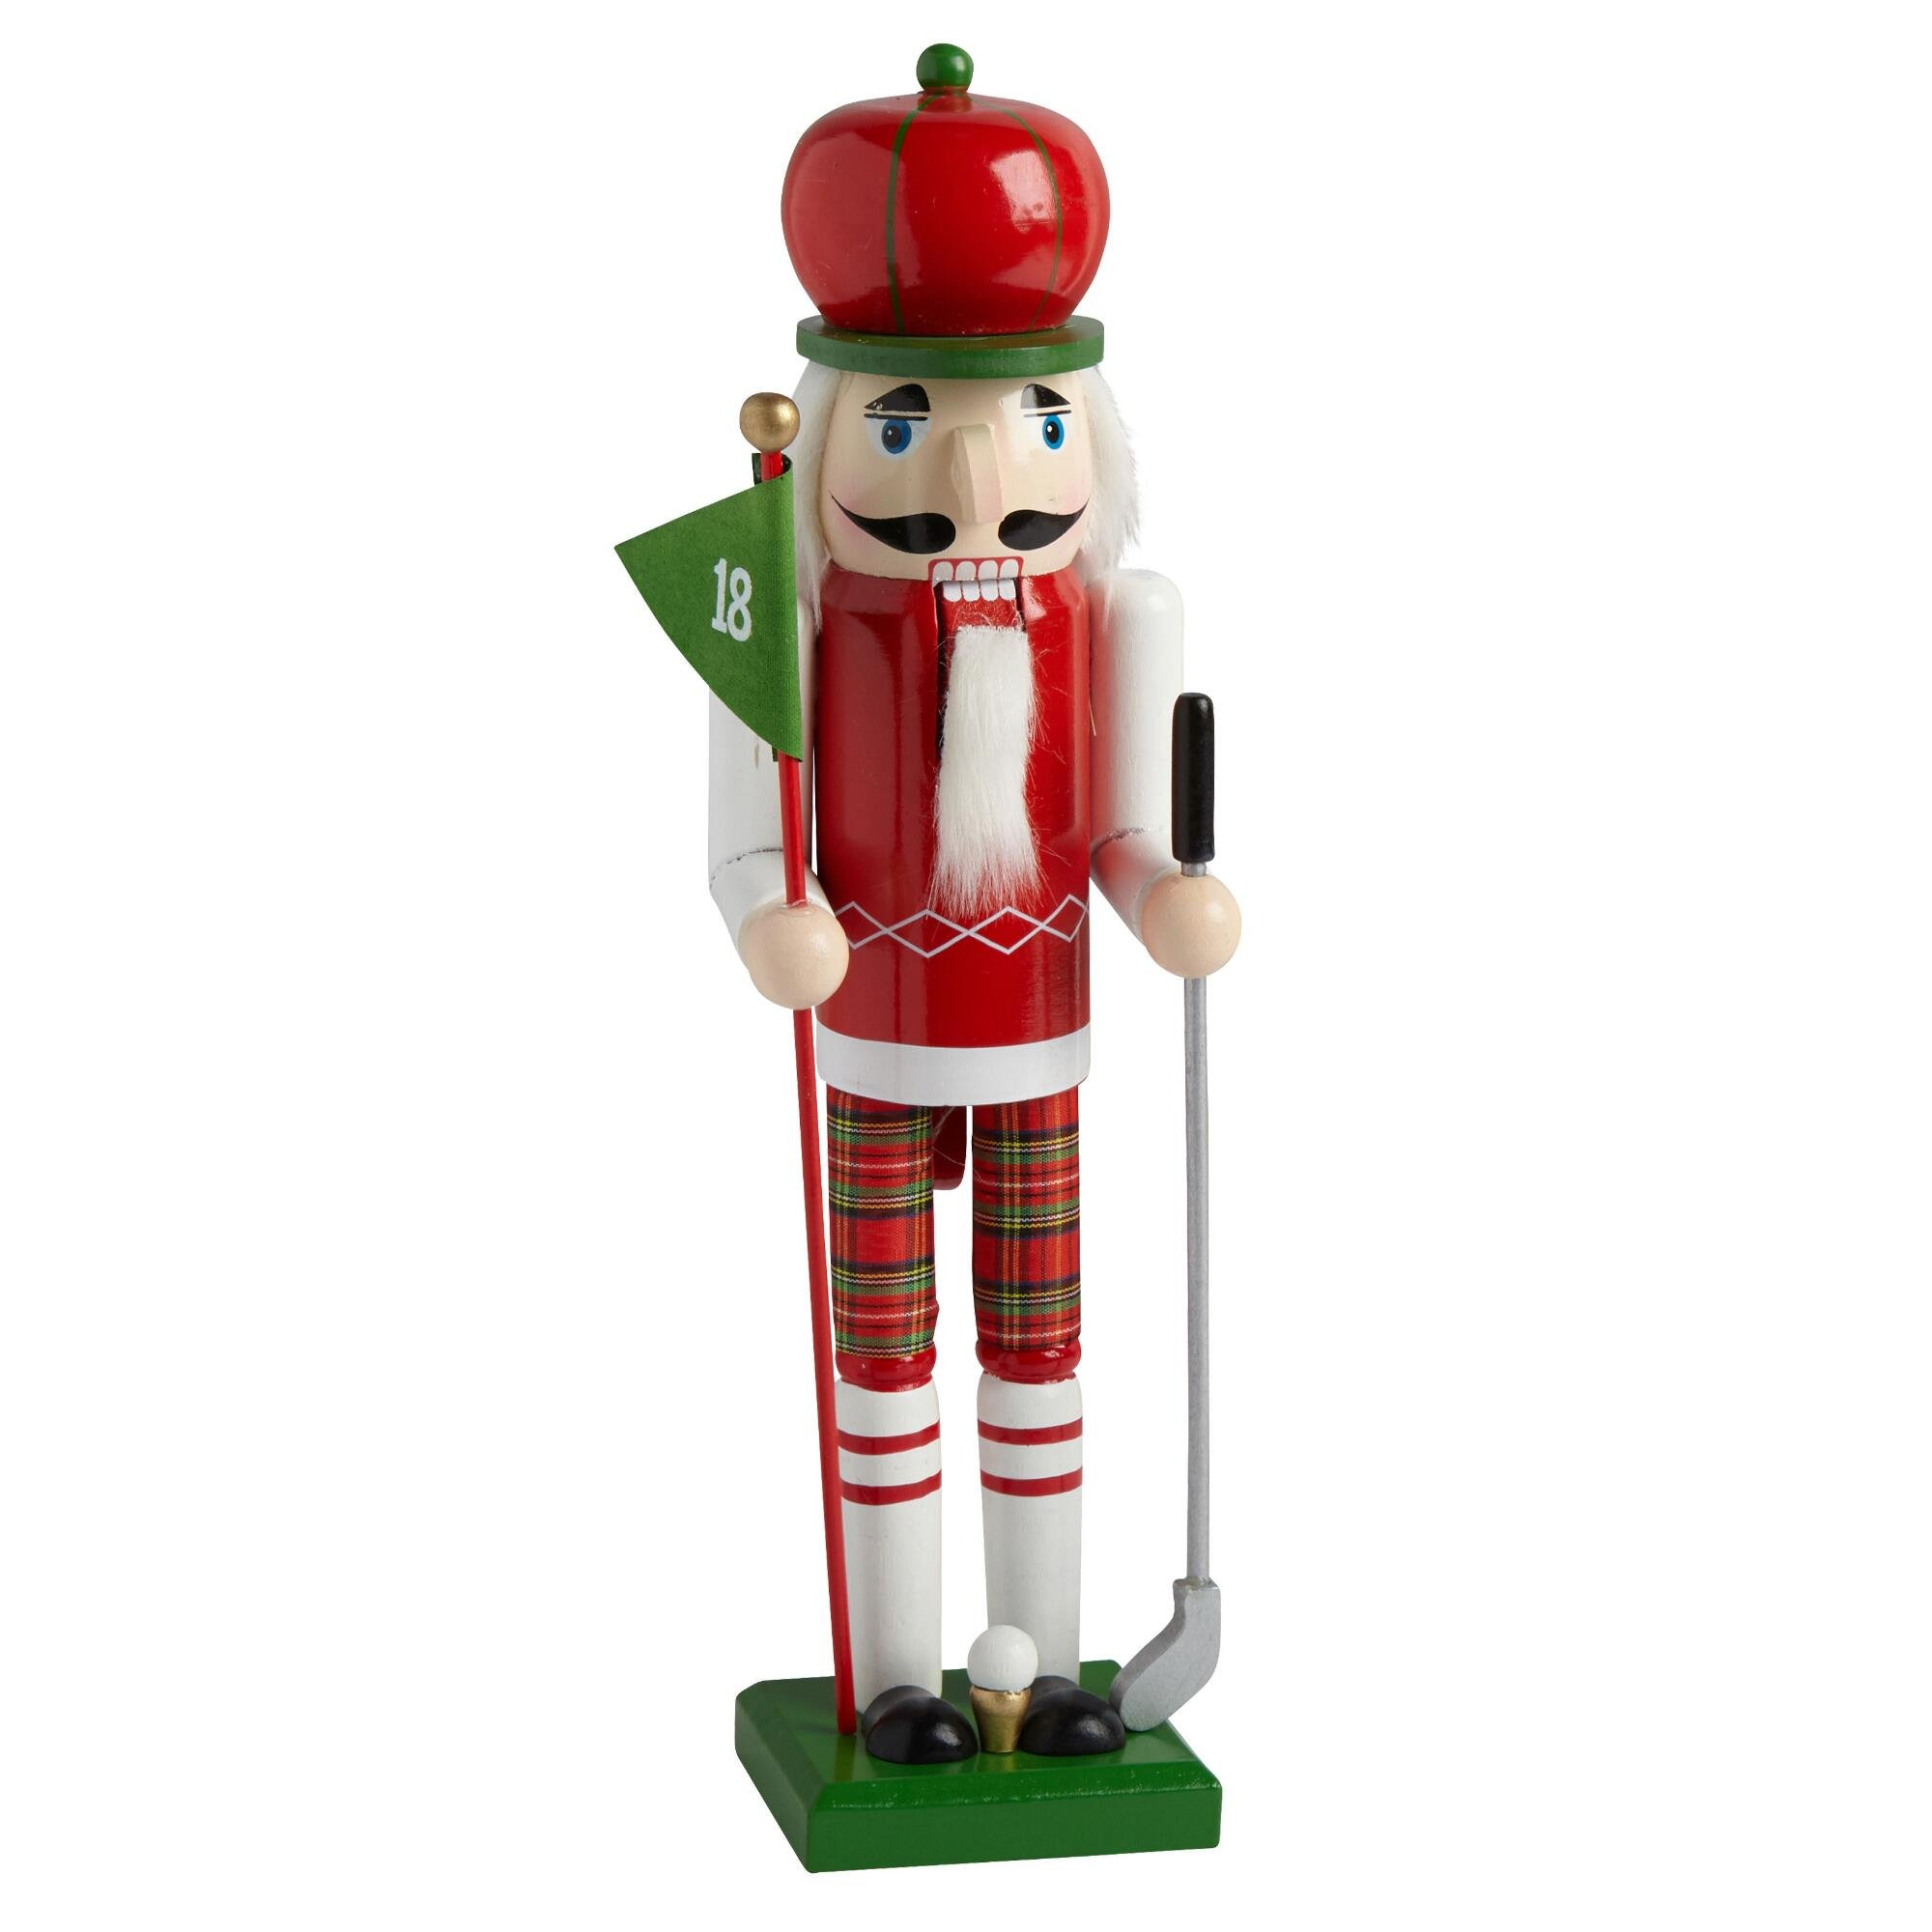 Nantucket Home Wooden Christmas Nutcracker Decor, 15-Inch, Golfer